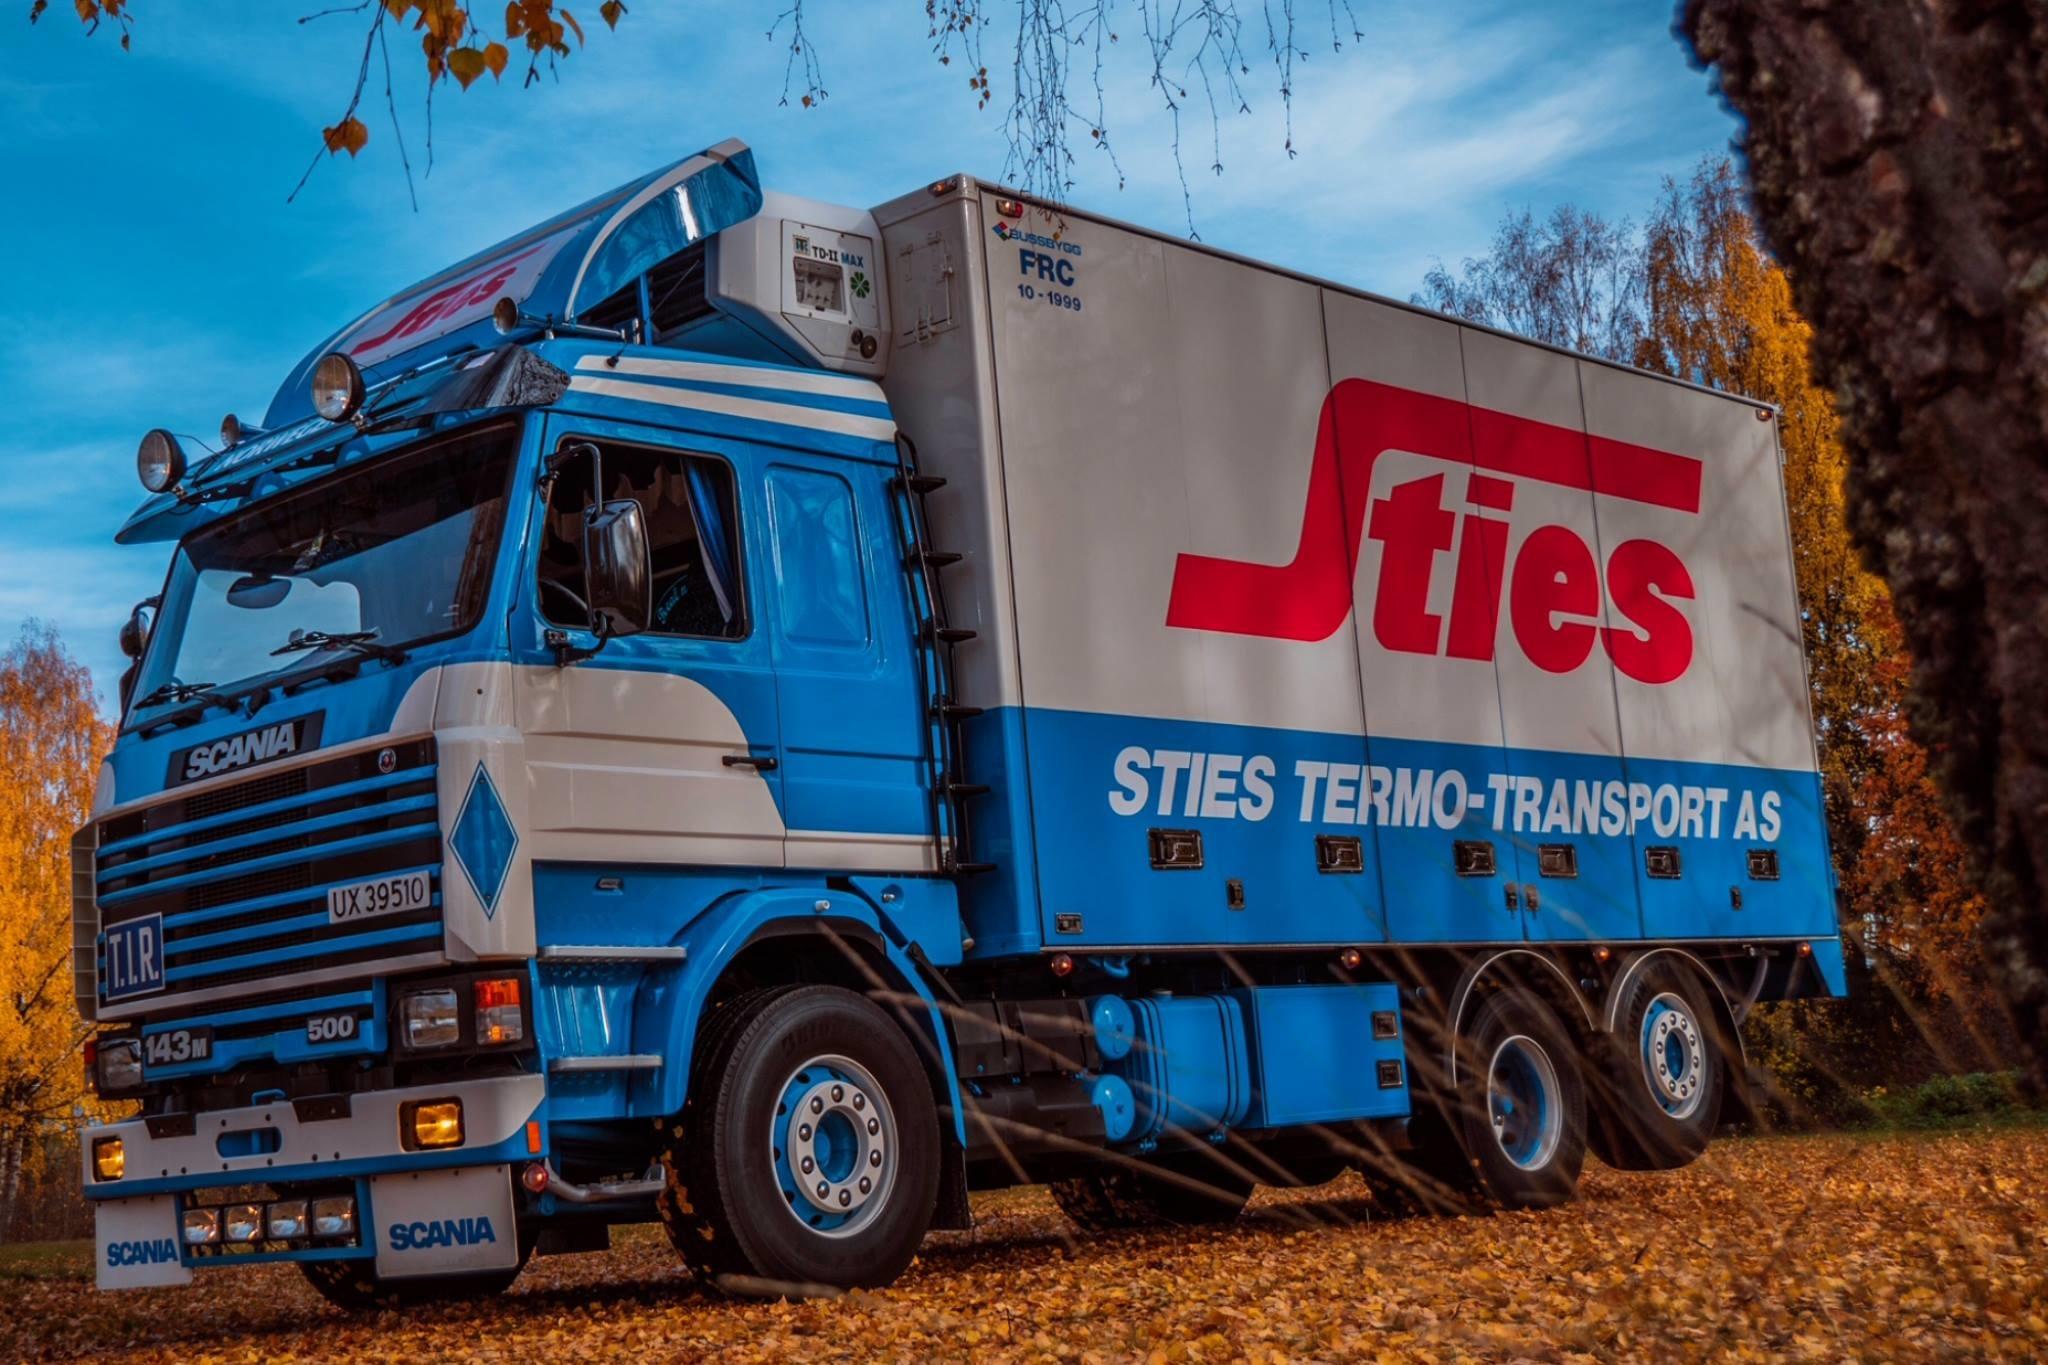 Scania-143-M-500--2